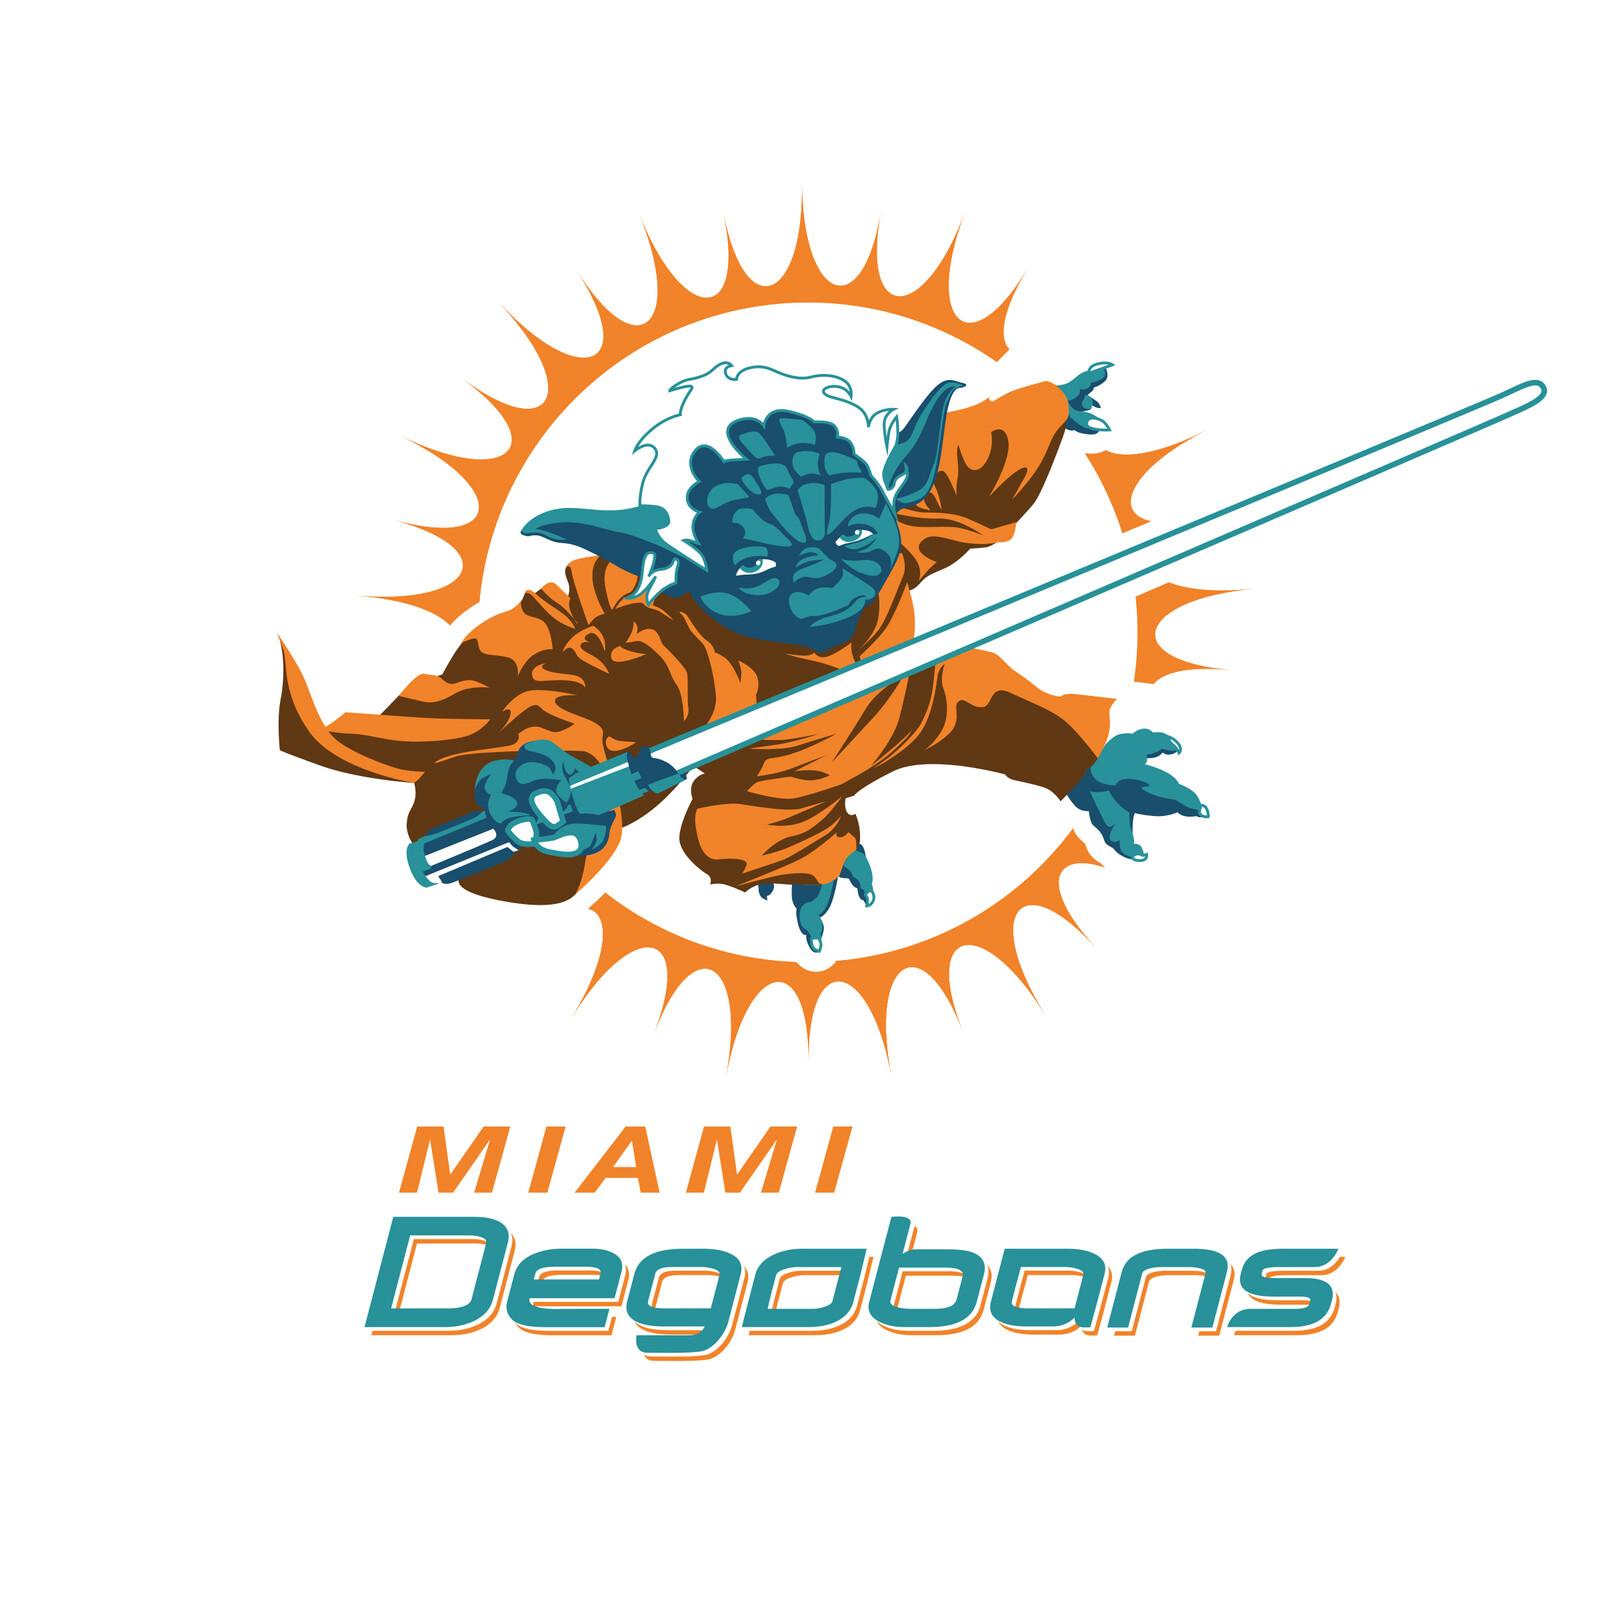 Miami Degobans